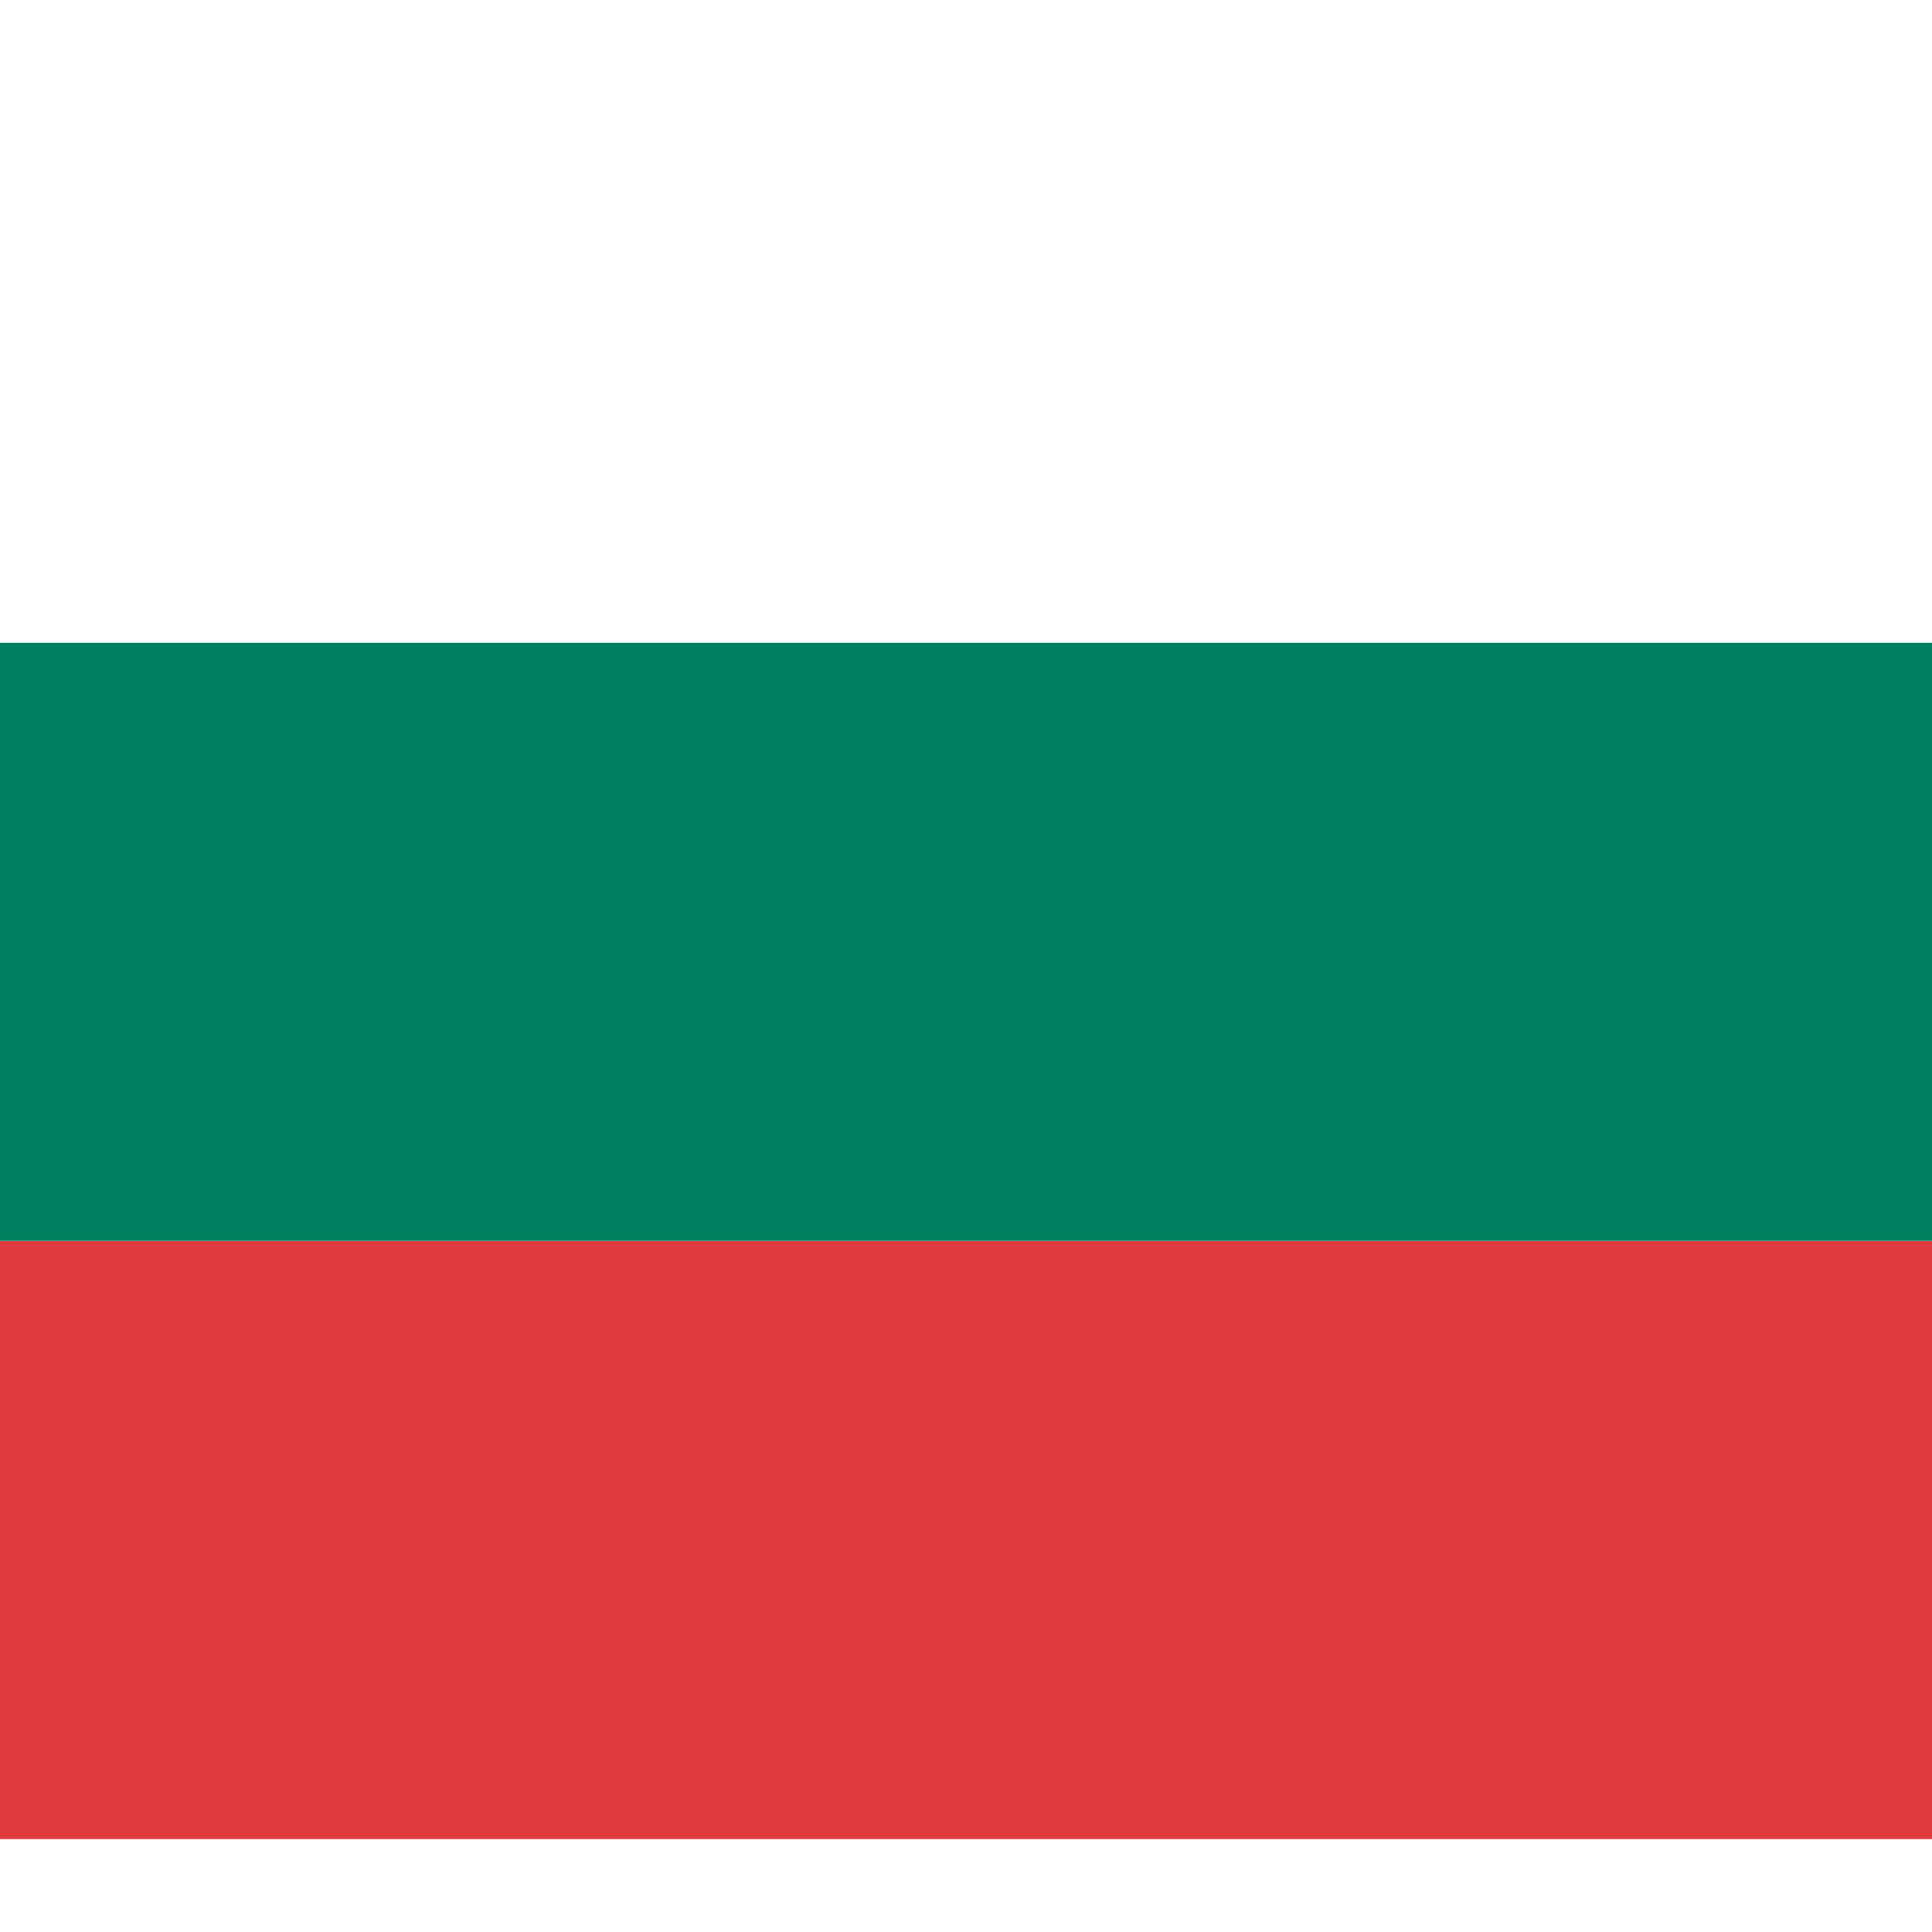 Bulgaria Flag Drapeau Bandiera Bandeira Flagga flagartist ...